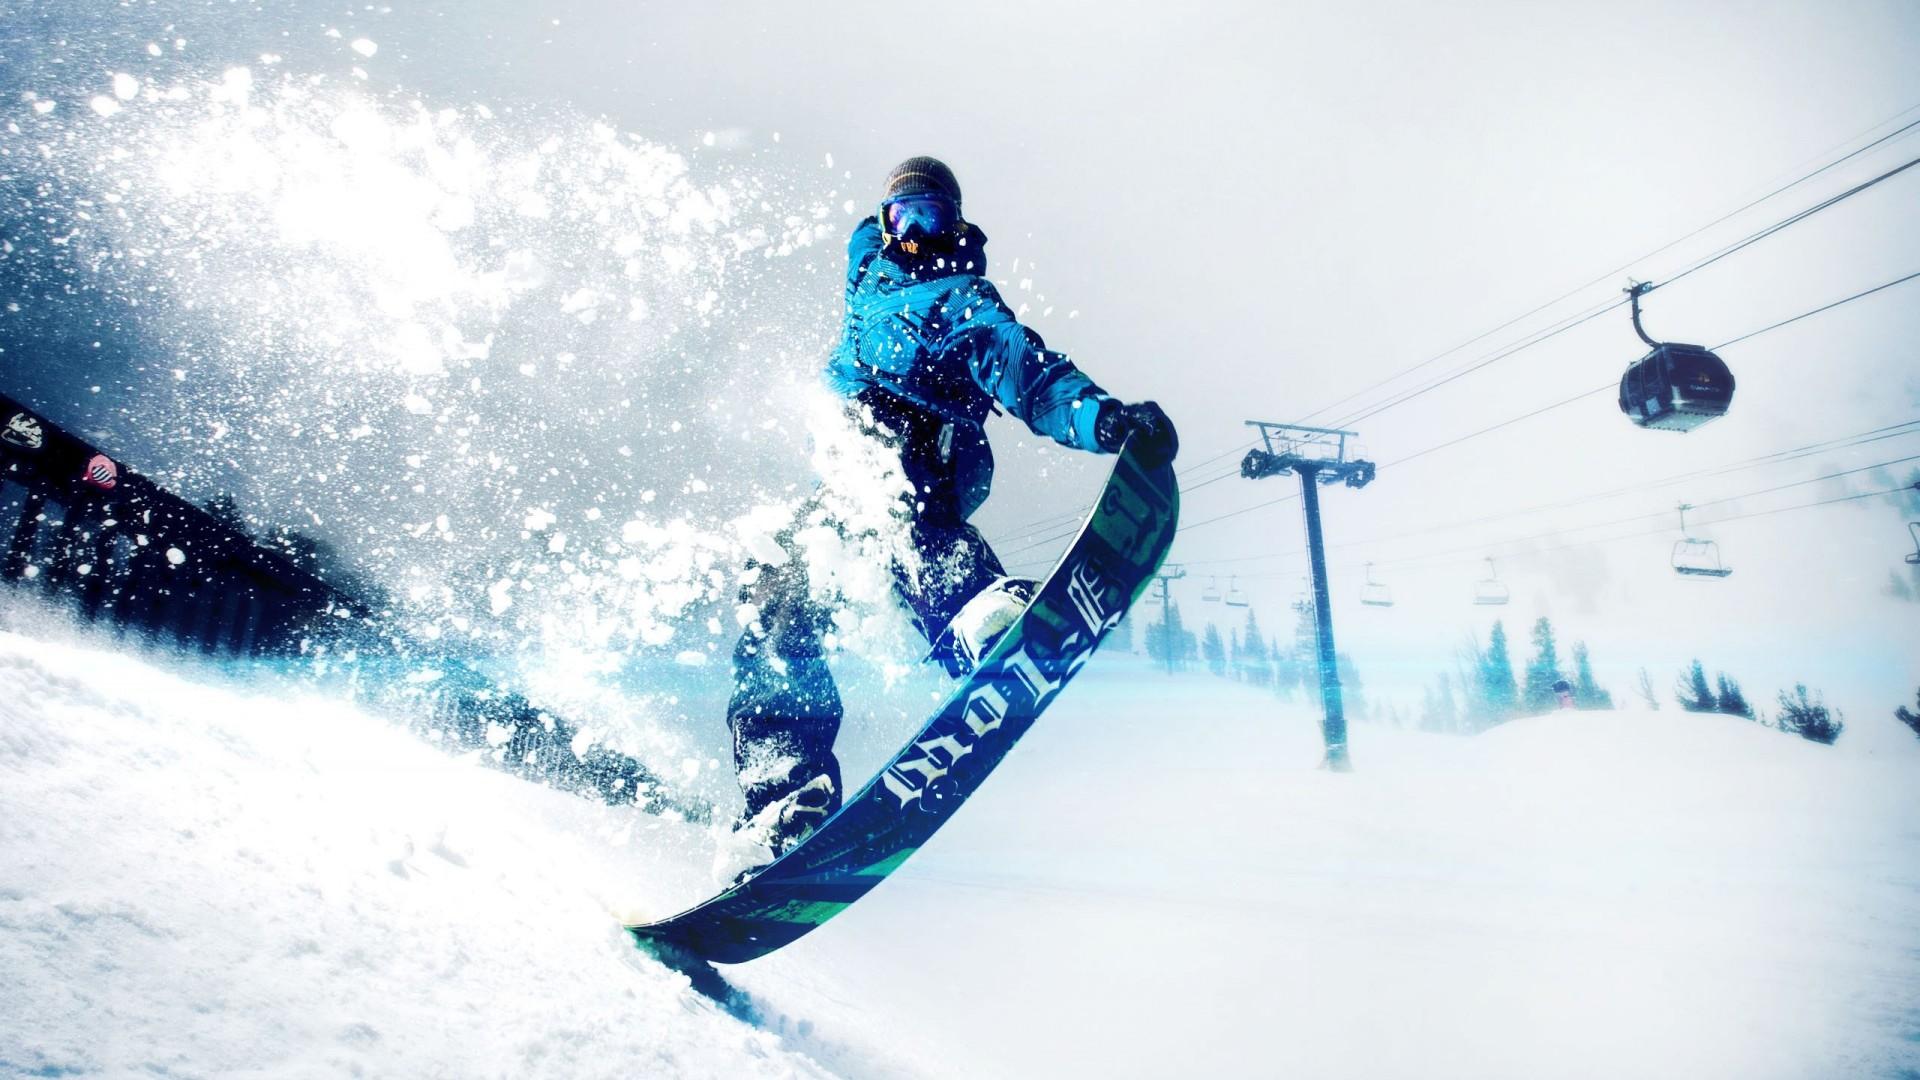 Michael Jordan Wallpaper Iphone 5 Snowskate Winter Sports Wallpapers Hd Wallpapers Id 18542